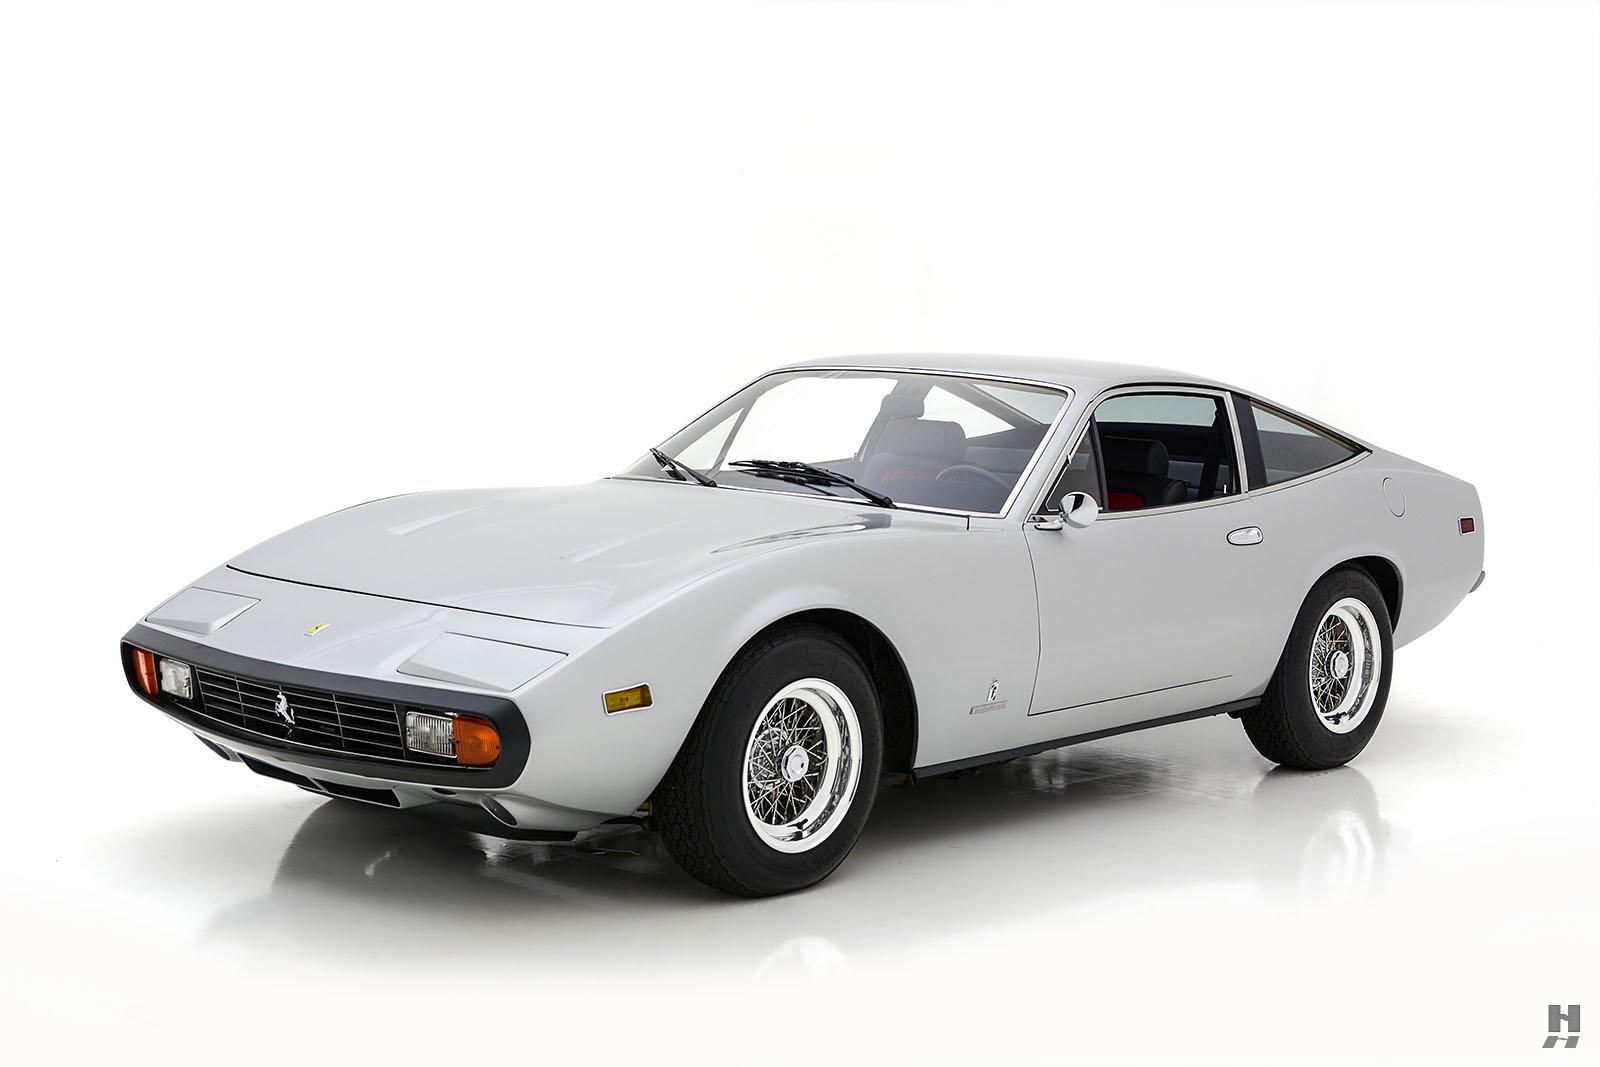 1972 FERRARI 365 GTC/4 COUPE For Sale (picture 1 of 6)